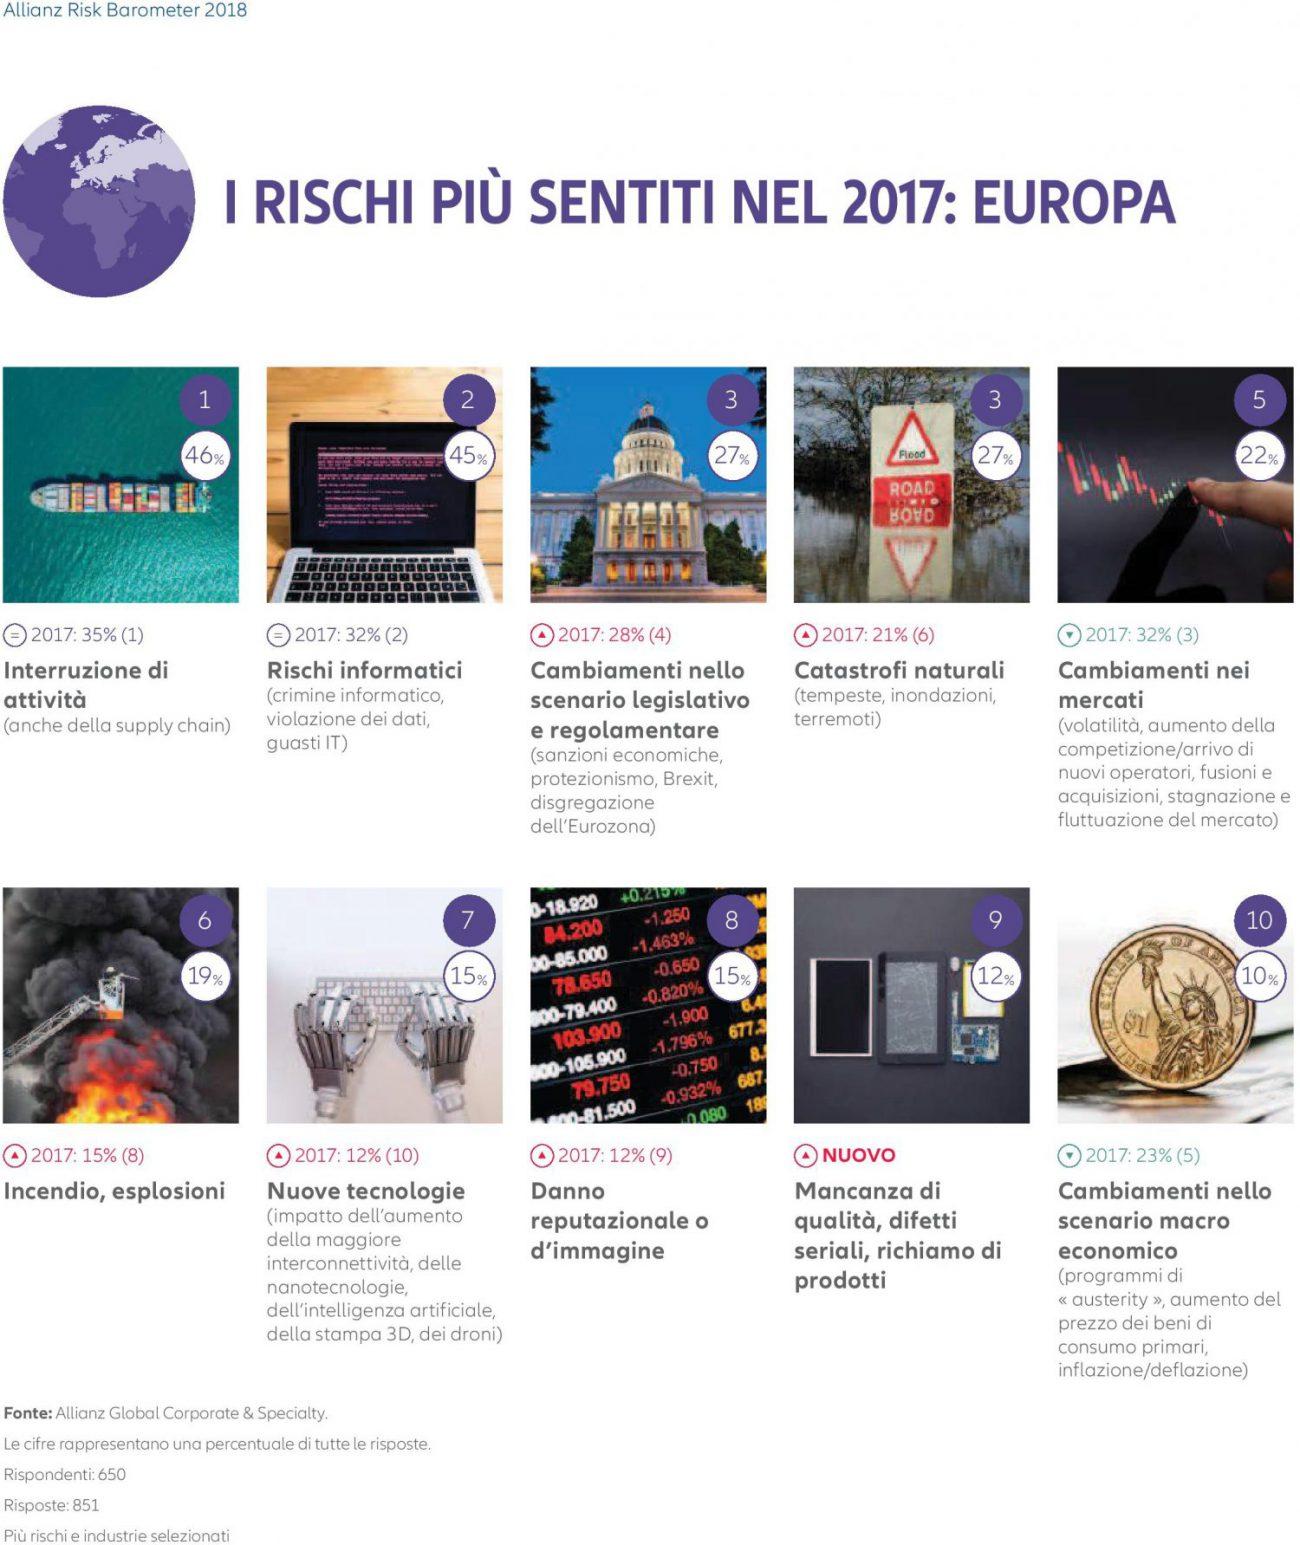 Allianz Risk Barometer 2018 - Top 10 Rischi Europa Imc